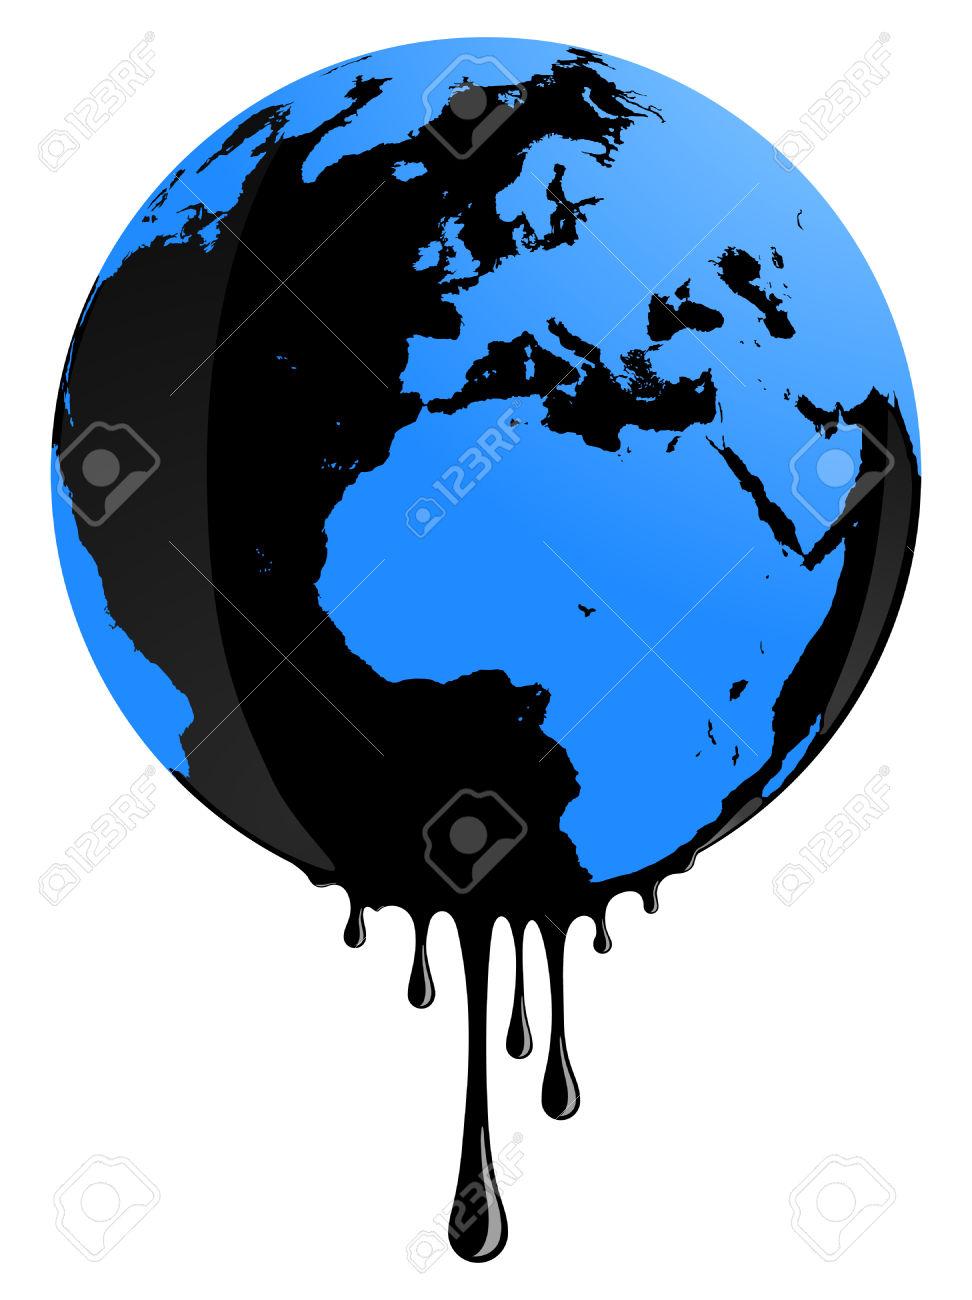 Planeten clipart half world. Global free download best